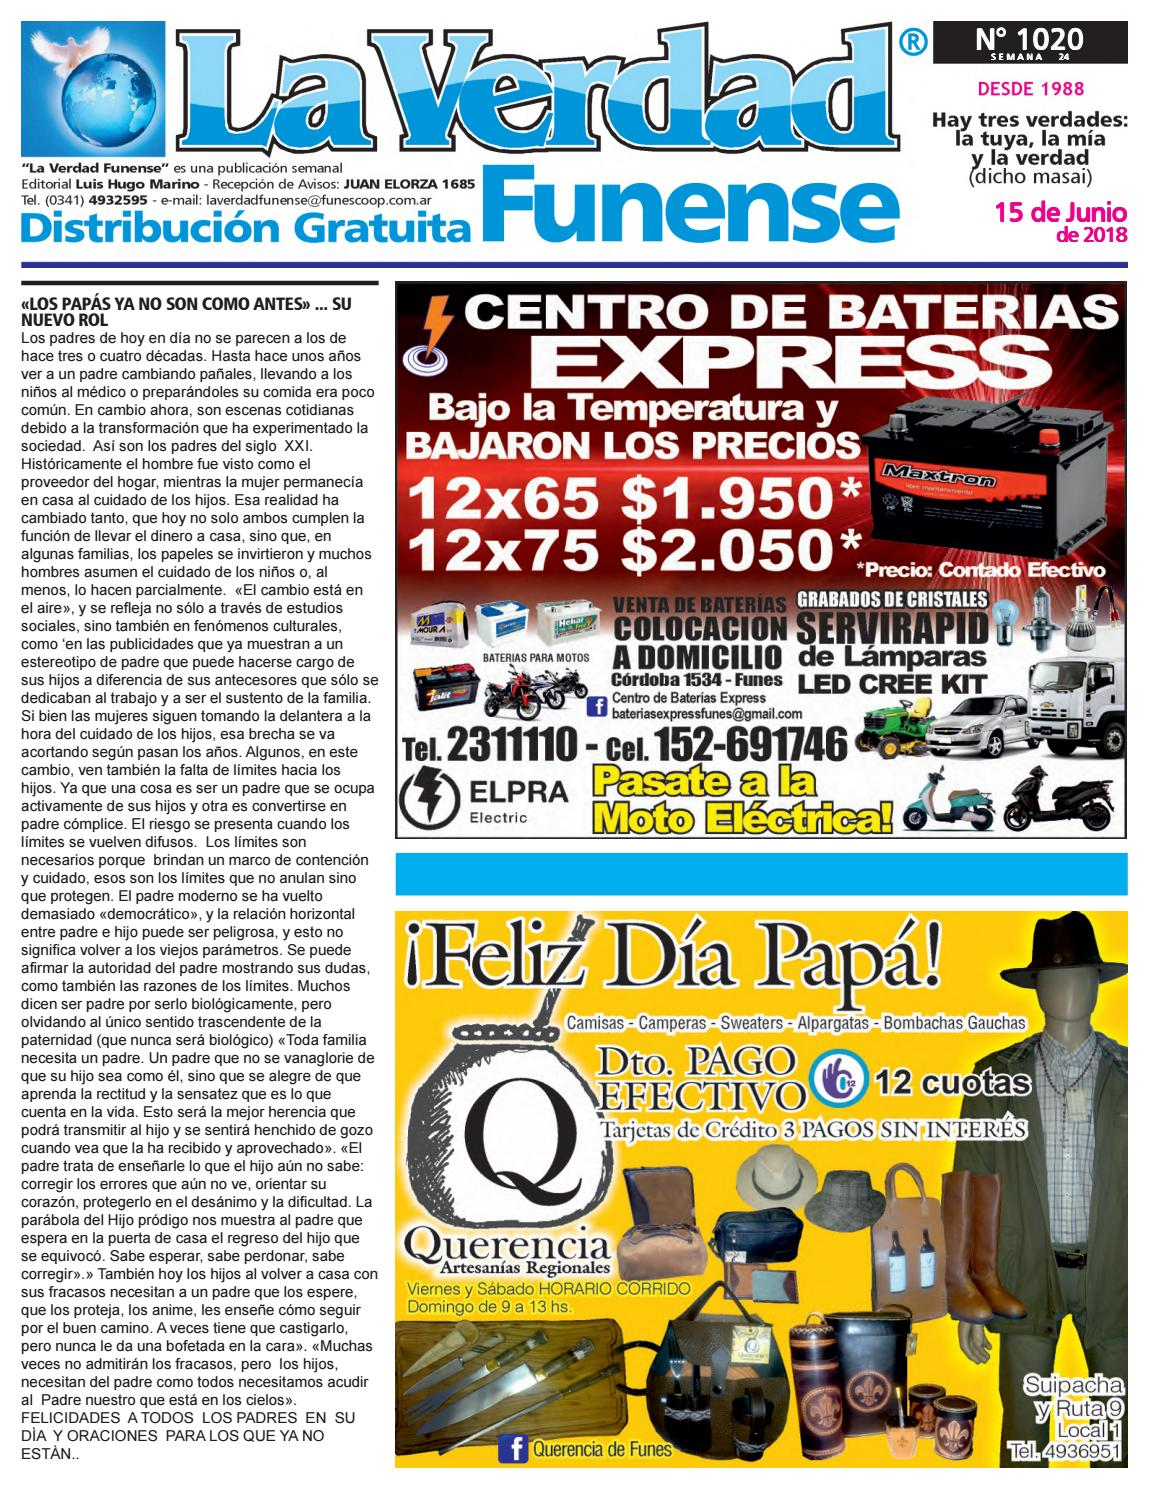 8aacf1be7 1020 15 06 by La Verdad Funense - issuu